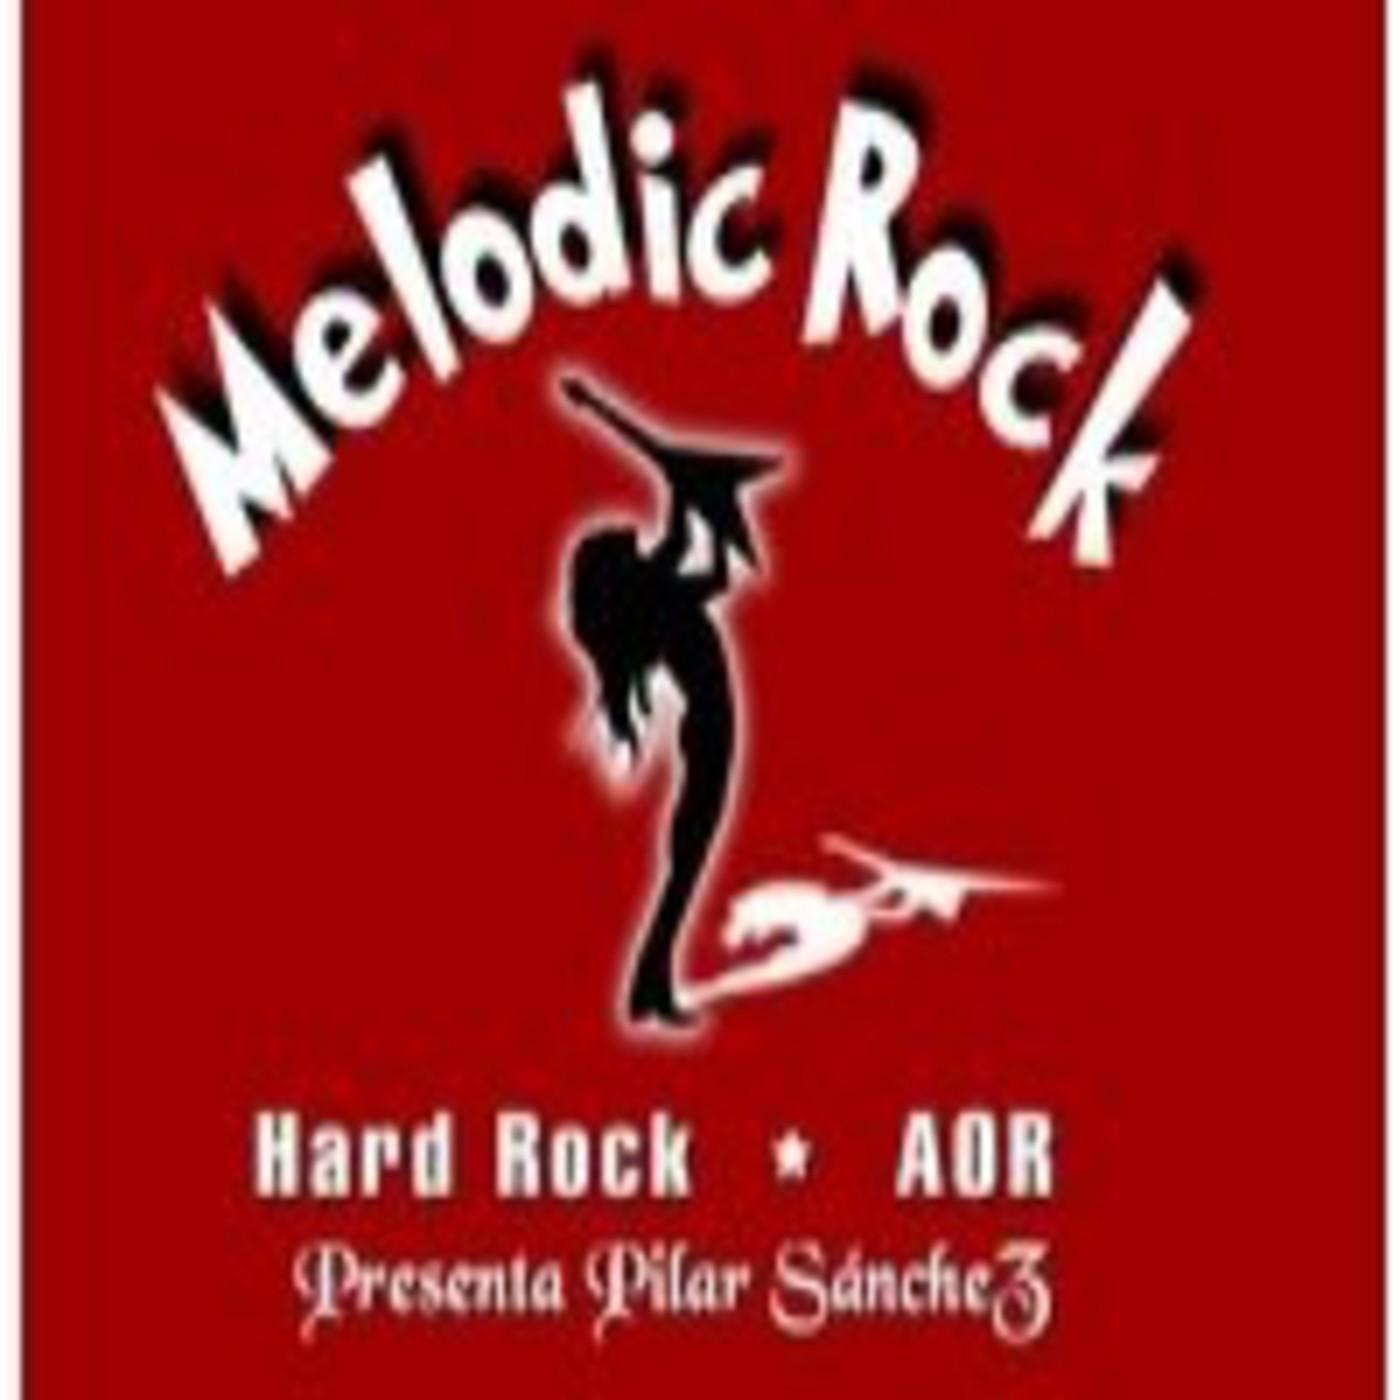 Melodic Rock - PASADIZO de la NOSTALGIA II - Encore 10-5-2008